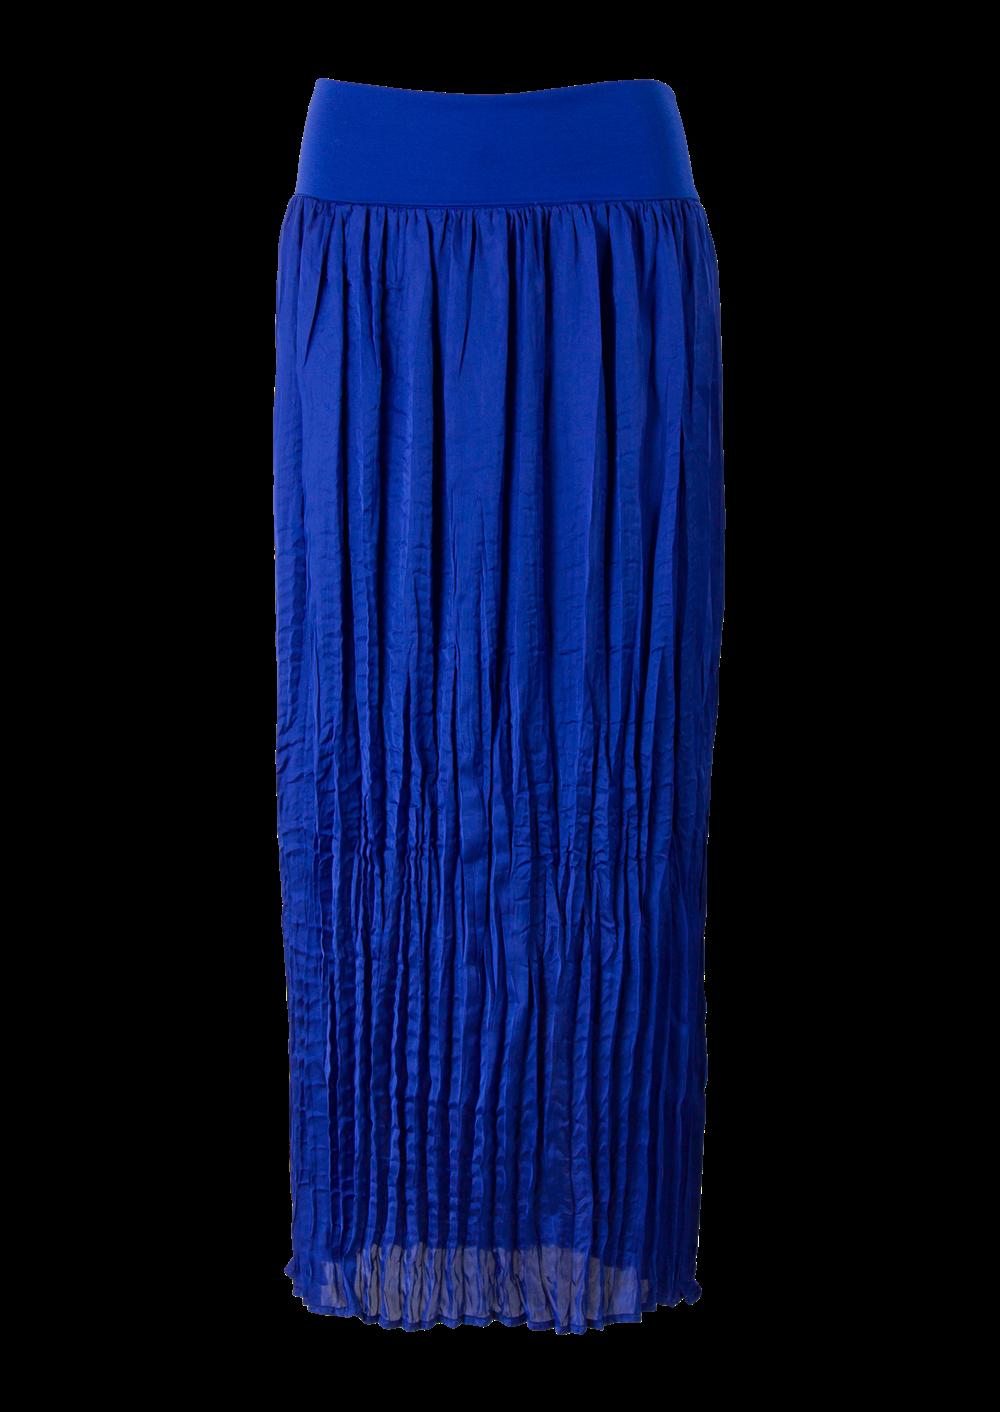 1130f1848348a6 Blauwe maxi rok in plissé met elastische tricot tailleband. Gemaakt van  soepele polyester glansstof.